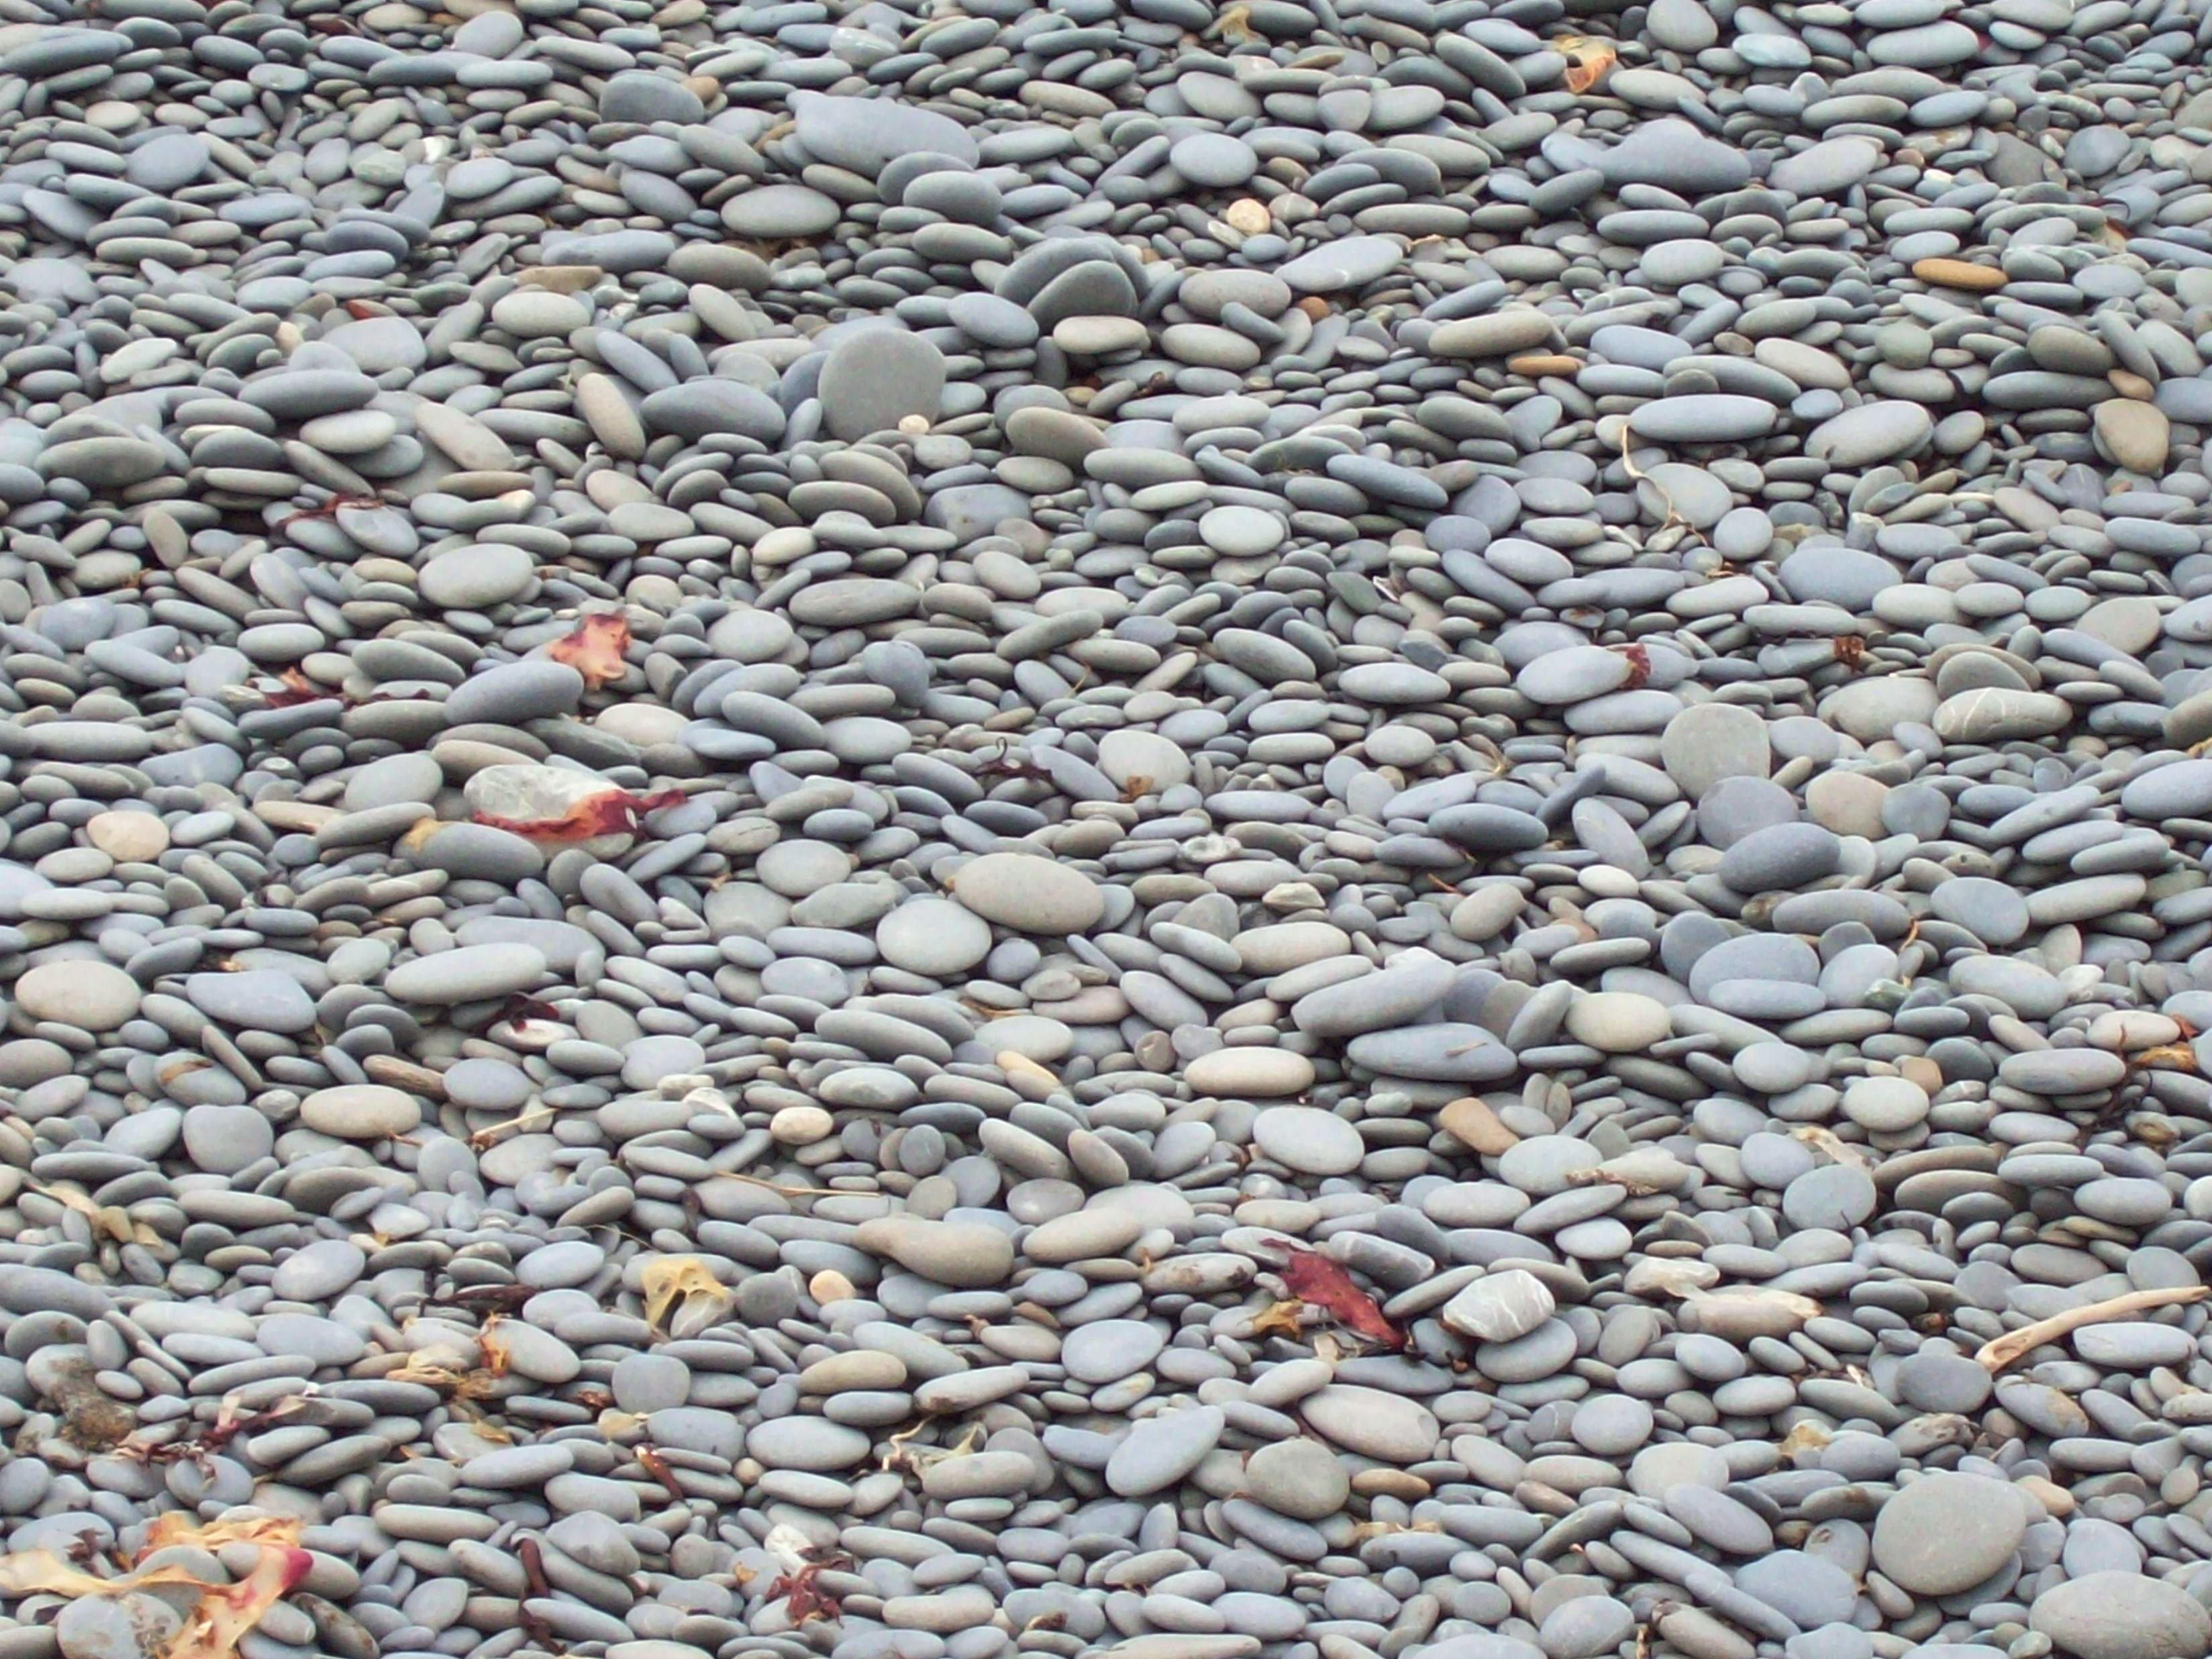 Granite pebbles - beached and sorted, Black, Granite, Pebbles, Red, HQ Photo